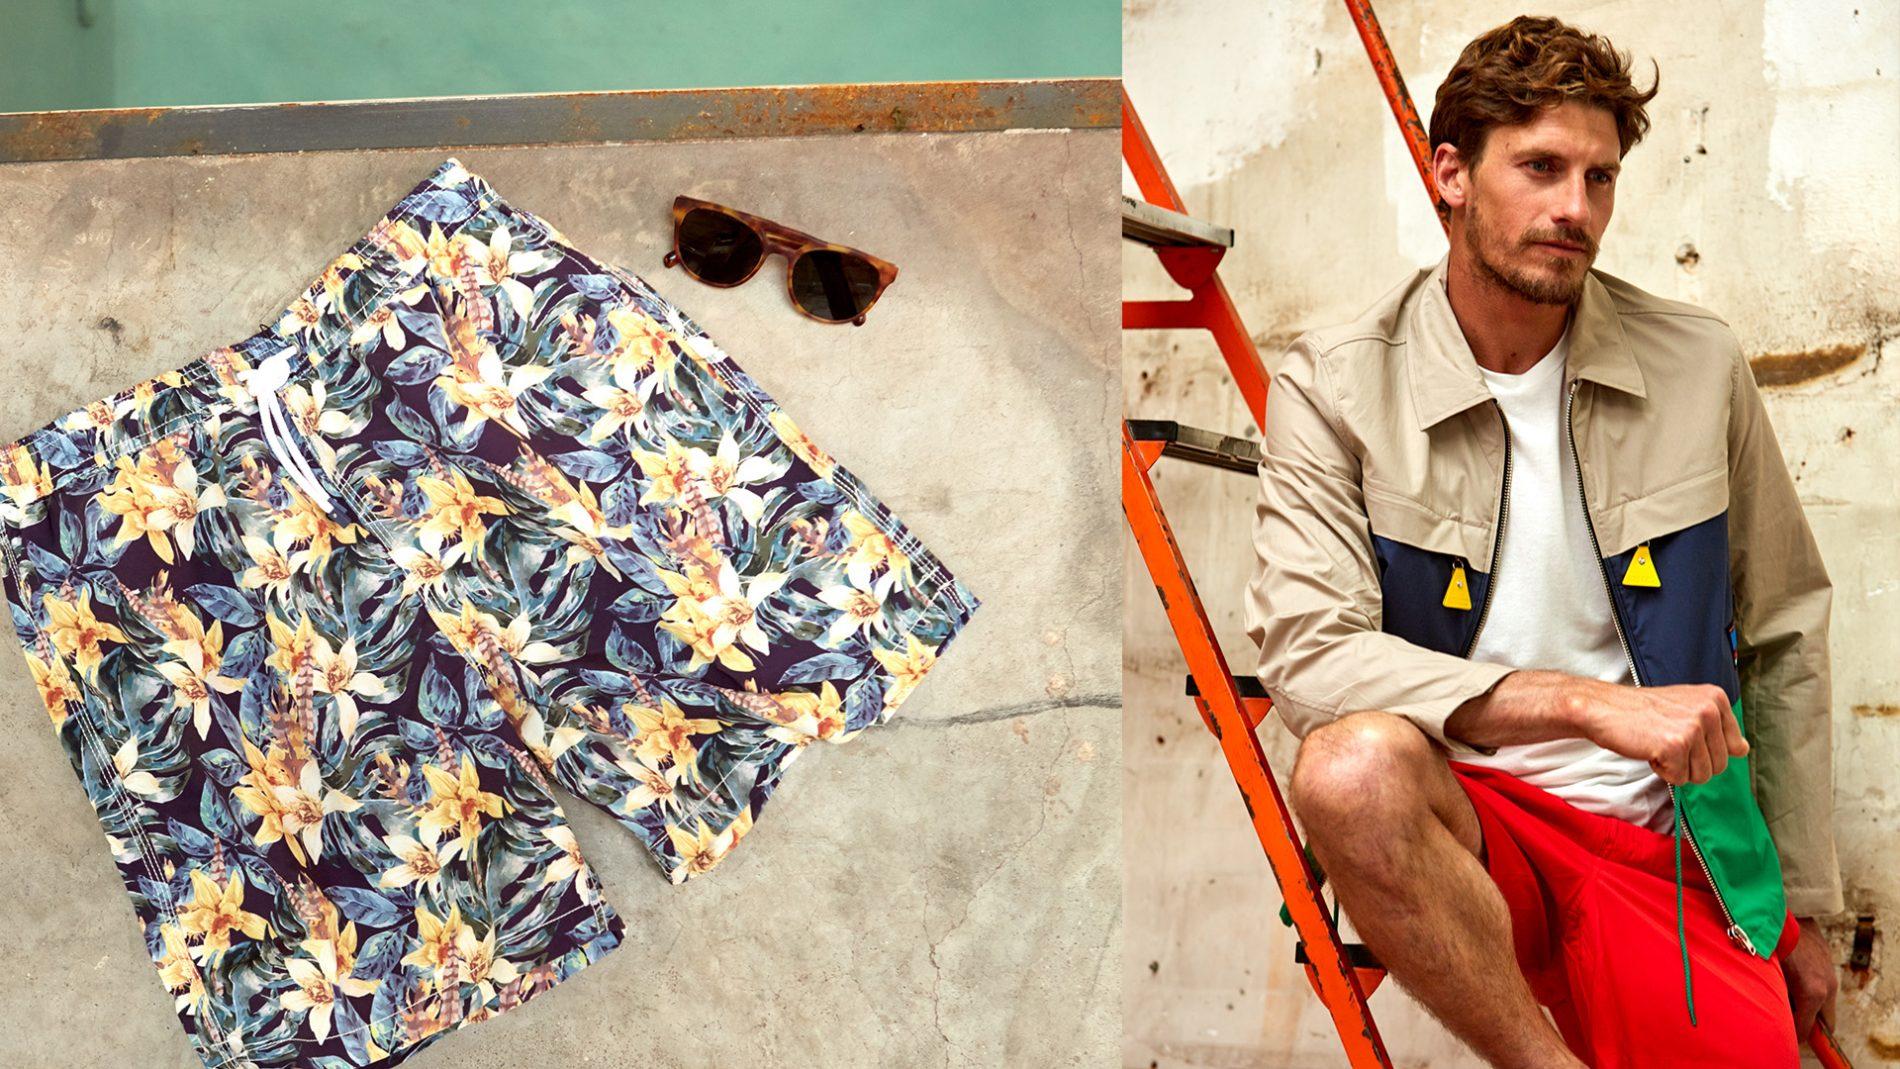 El Corte Inglés Designer Menswear Accessories Sunglasses Prada Michael Kors Kenzo Hackett